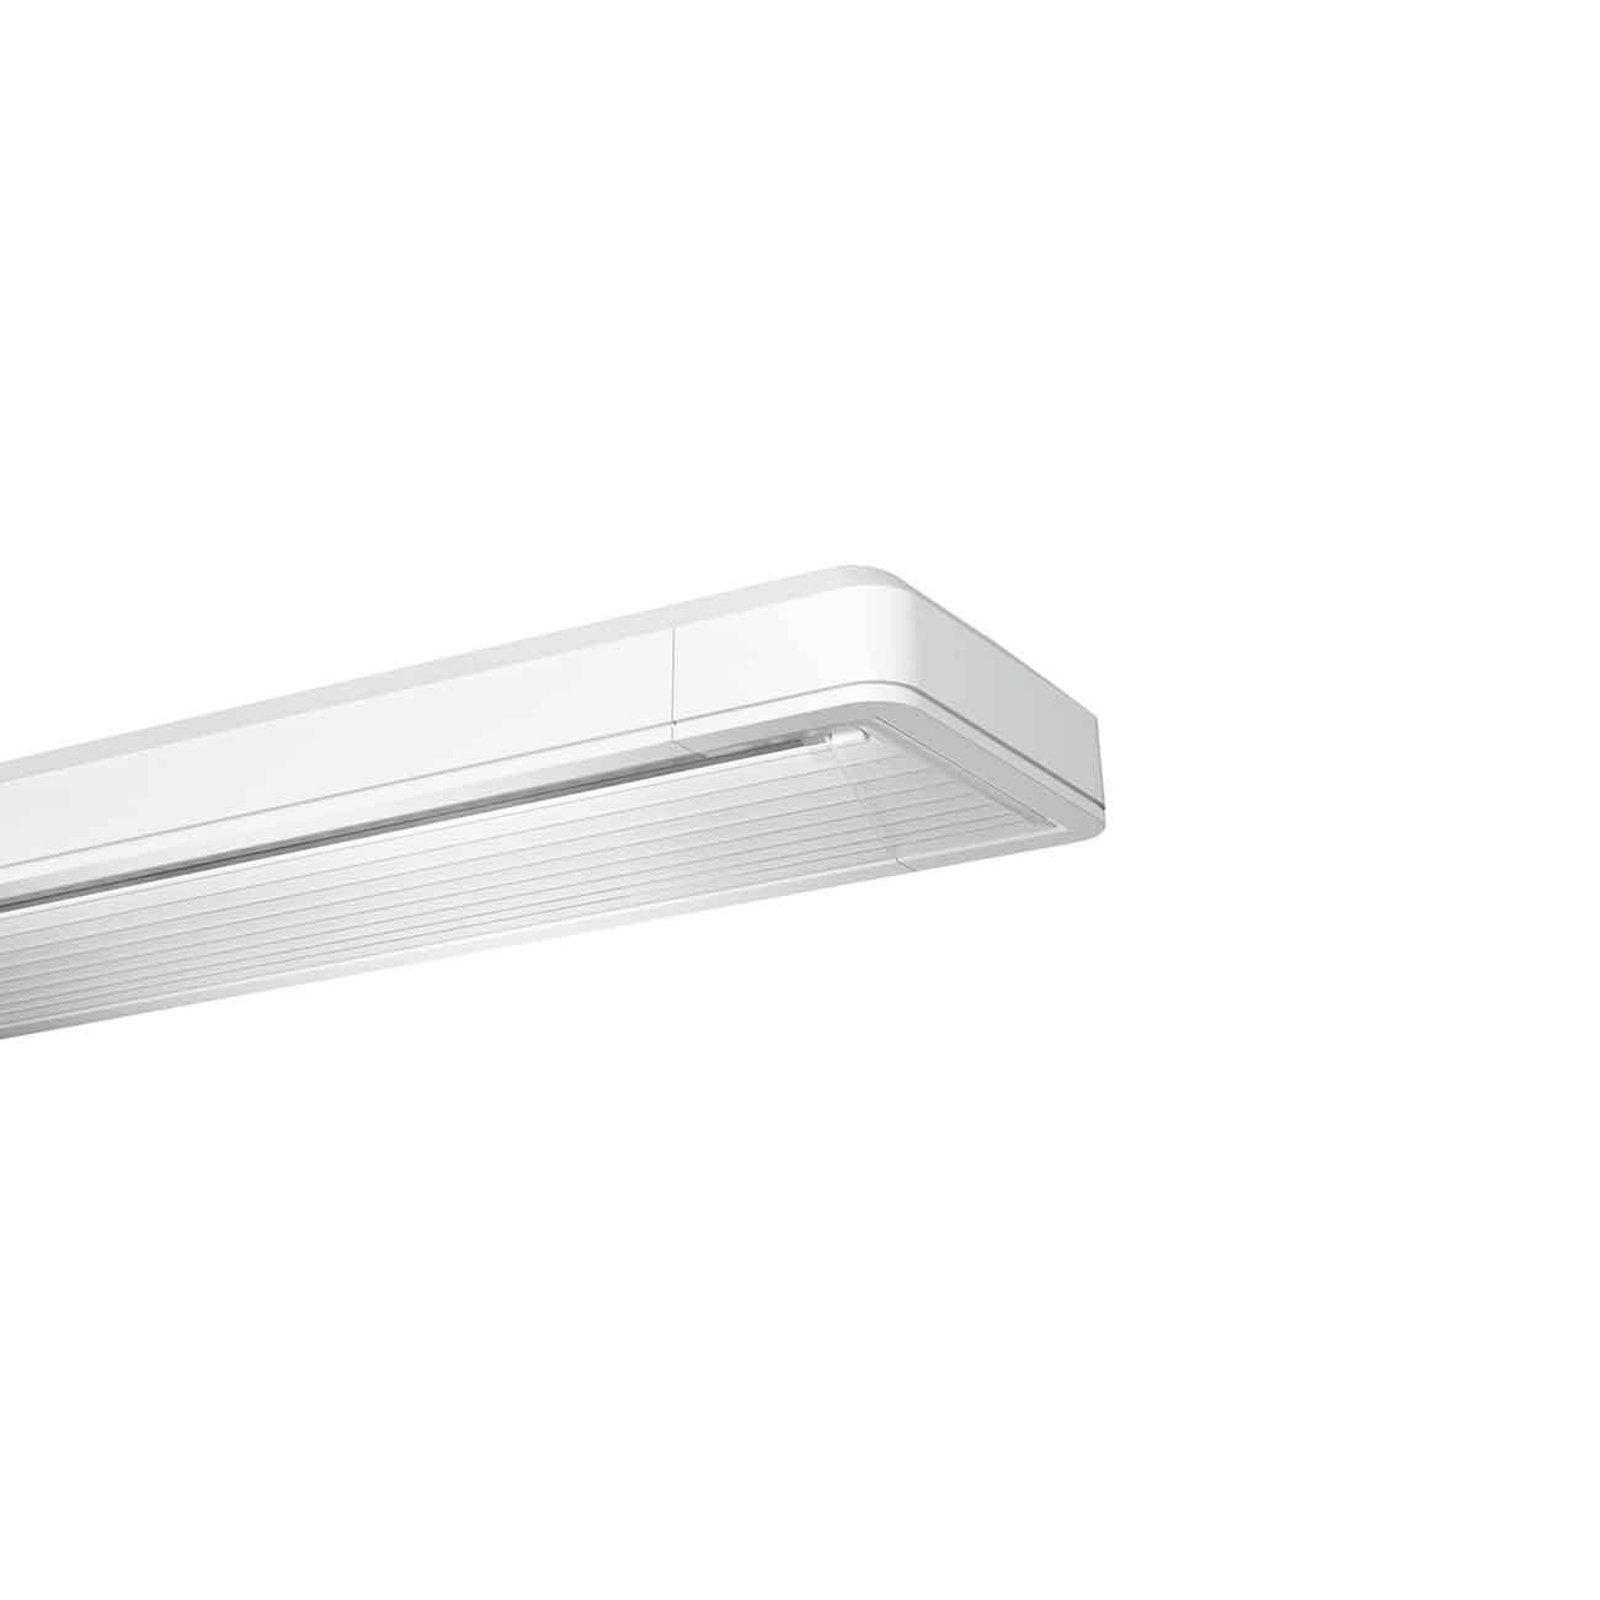 Siteco Taris LED-taklampe 123 cm el. ball. DALI